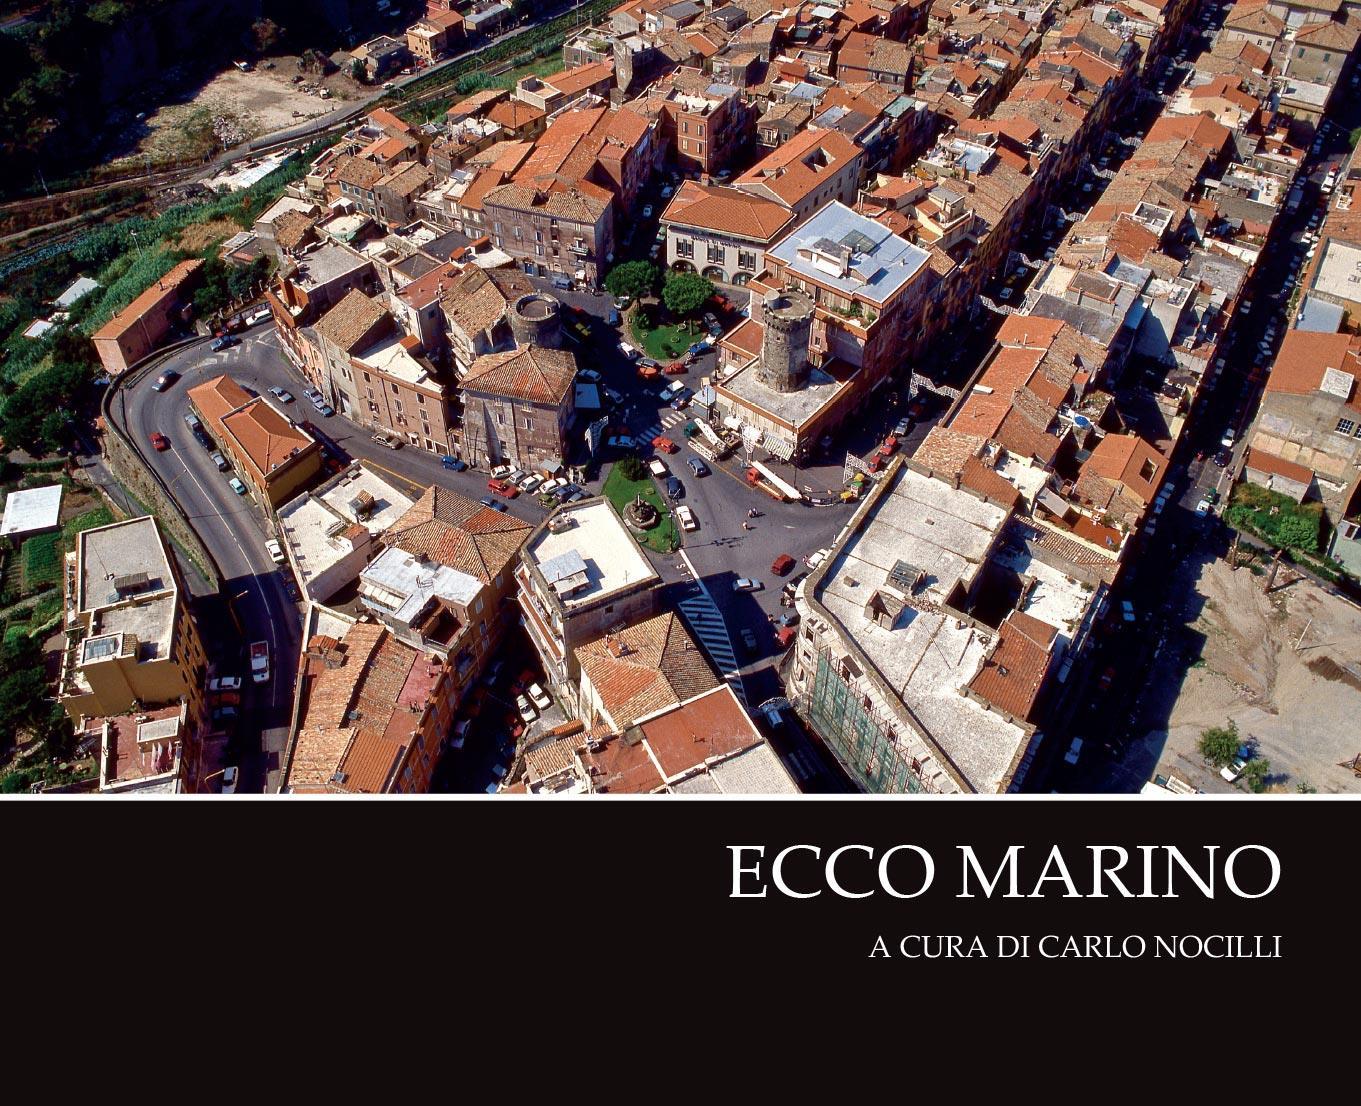 Ecco Marino